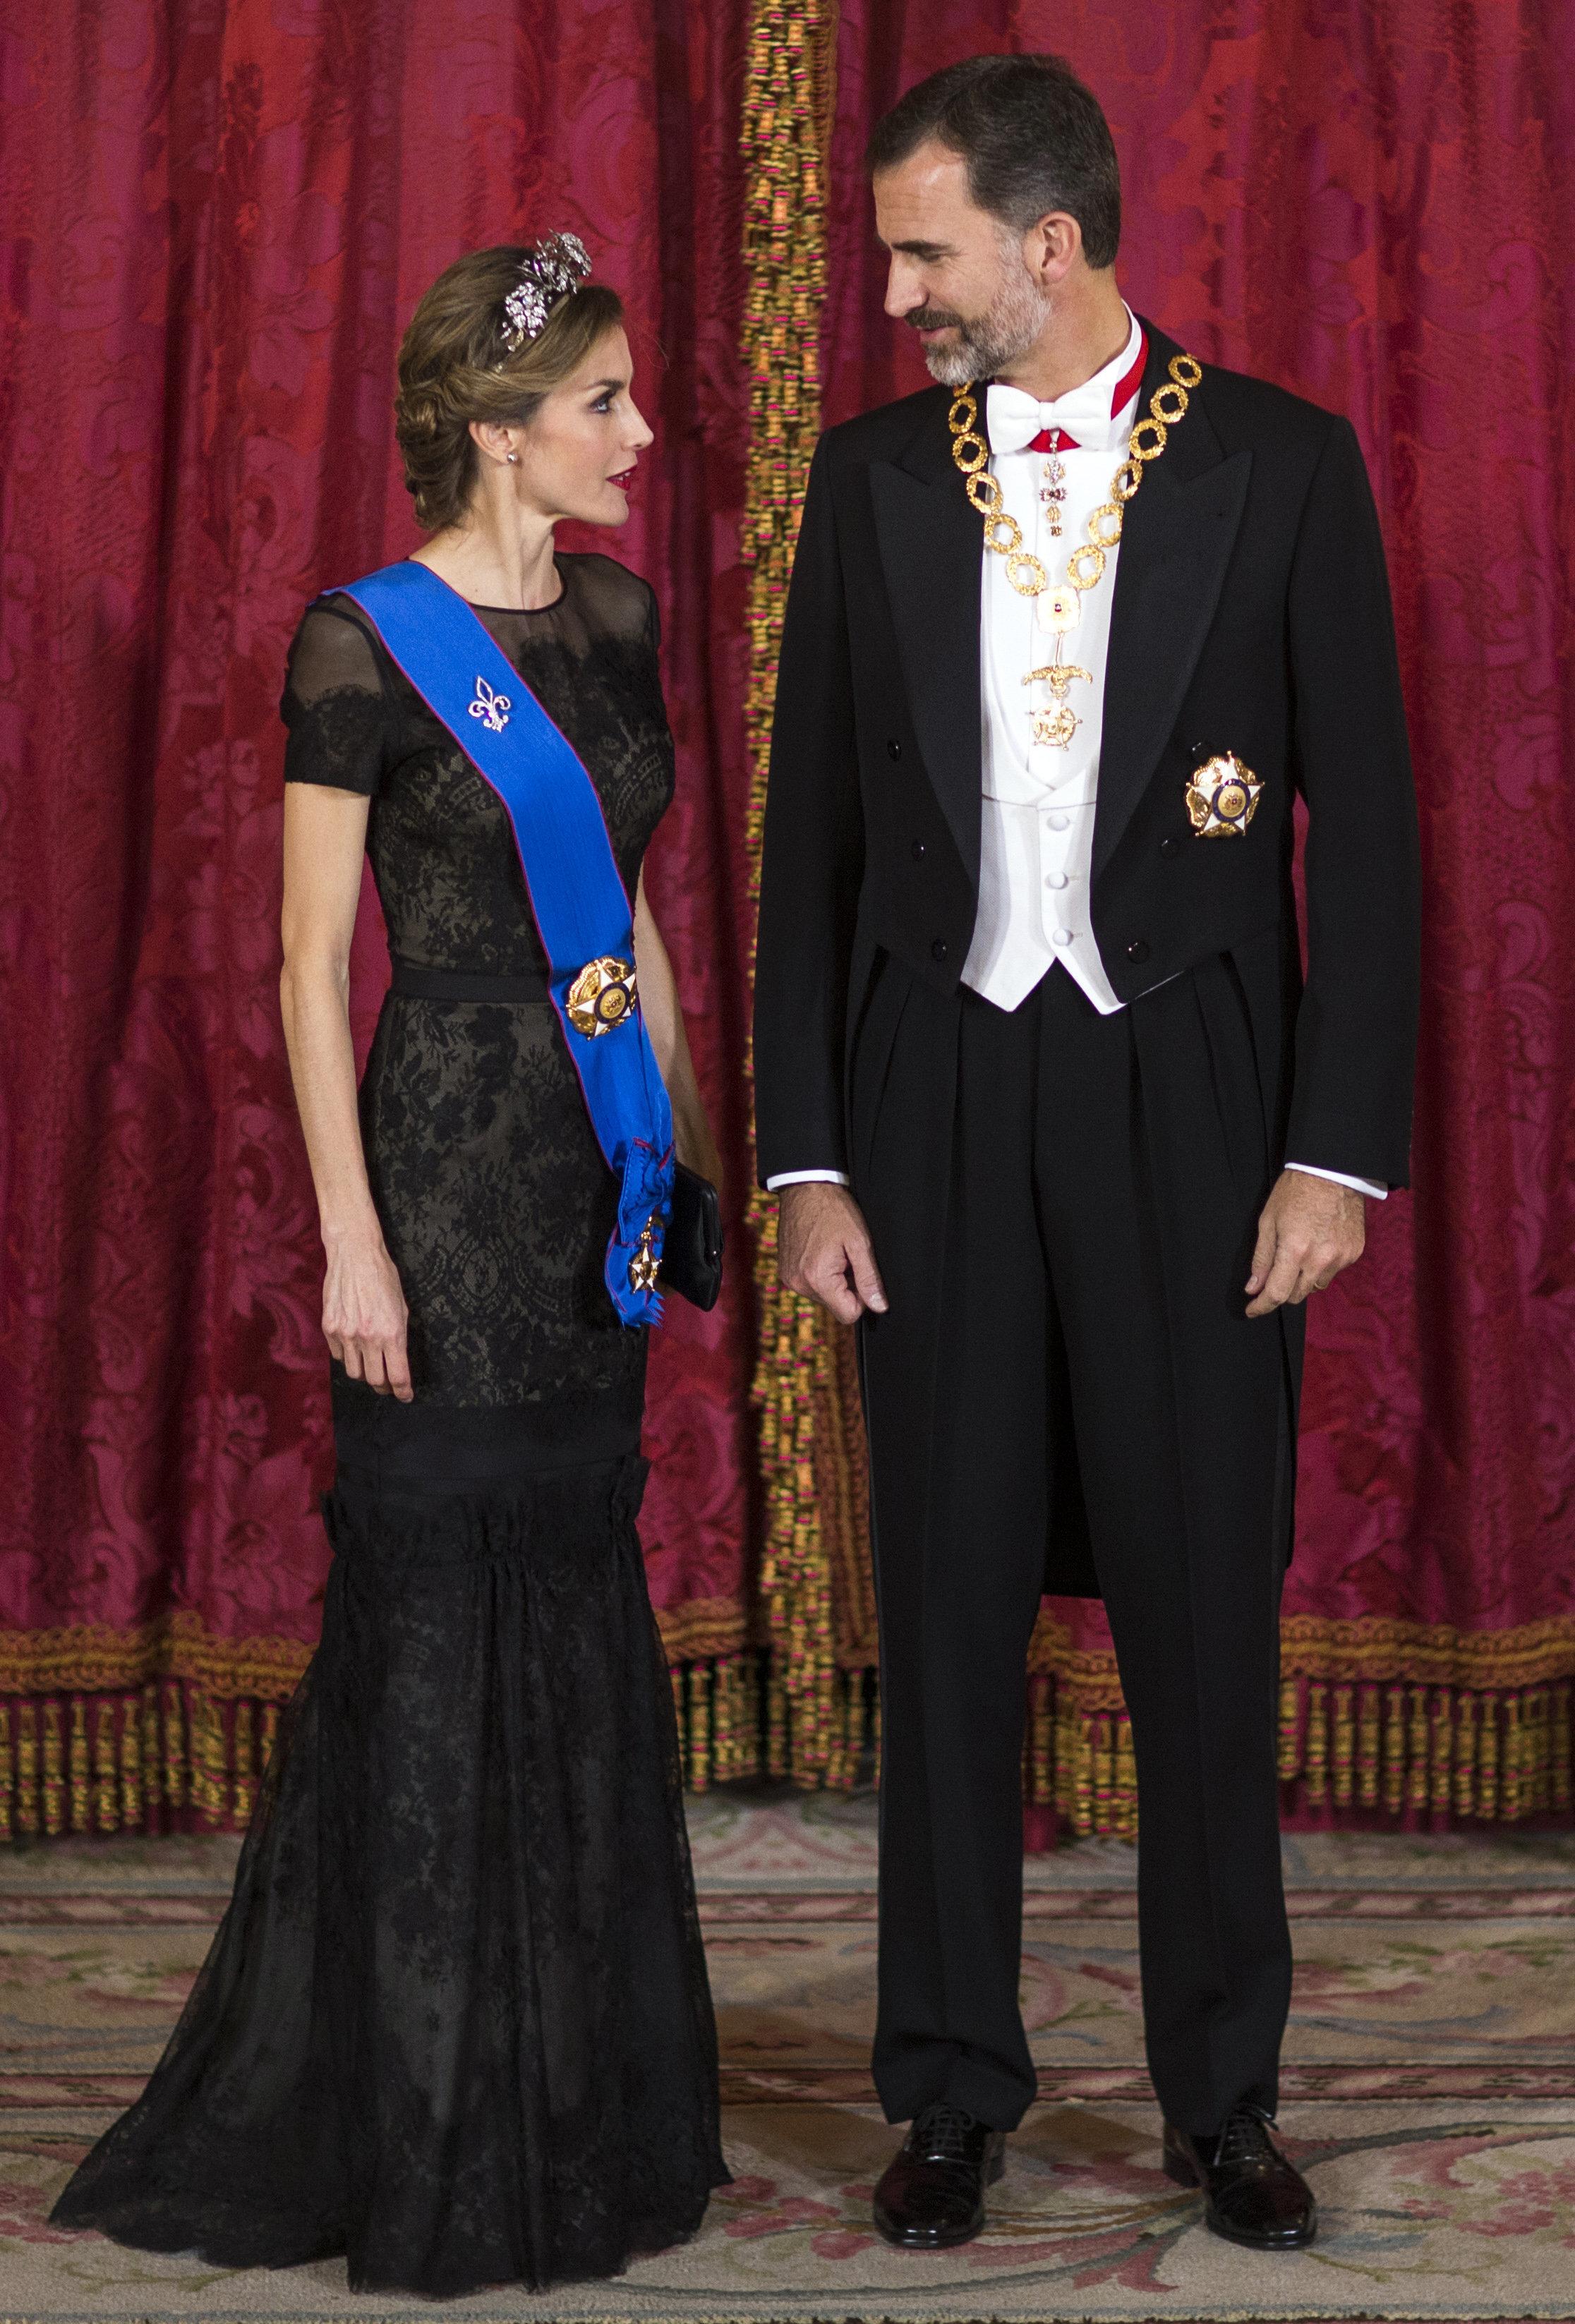 Король Испании Филипп VI и Королева Испании Летисиа принимают президента Чили в Королевском дворце Мадрида